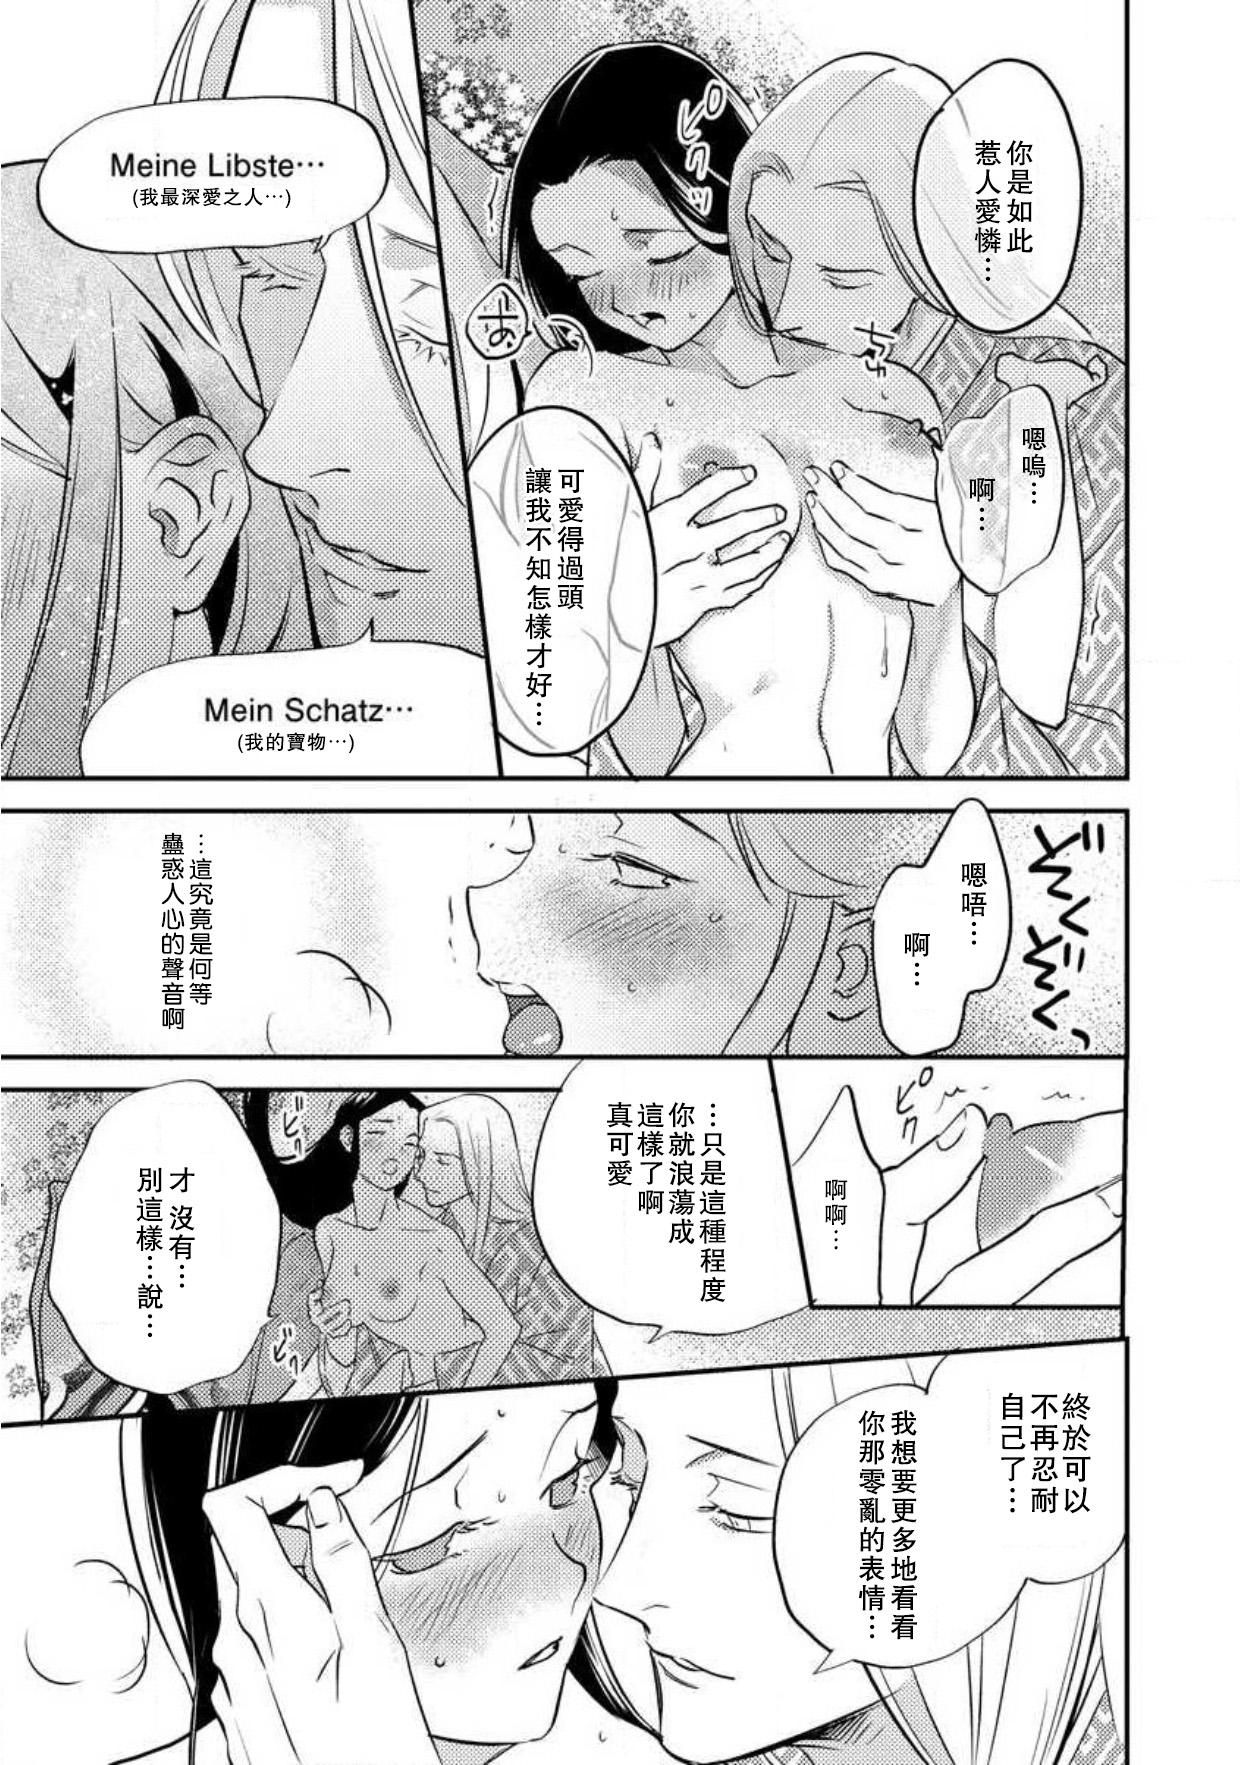 Oeyama suimutan utsukushiki oni no toraware hime | 大江山醉夢逸話 美麗的鬼與被囚禁的公主 Ch. 1-8 196